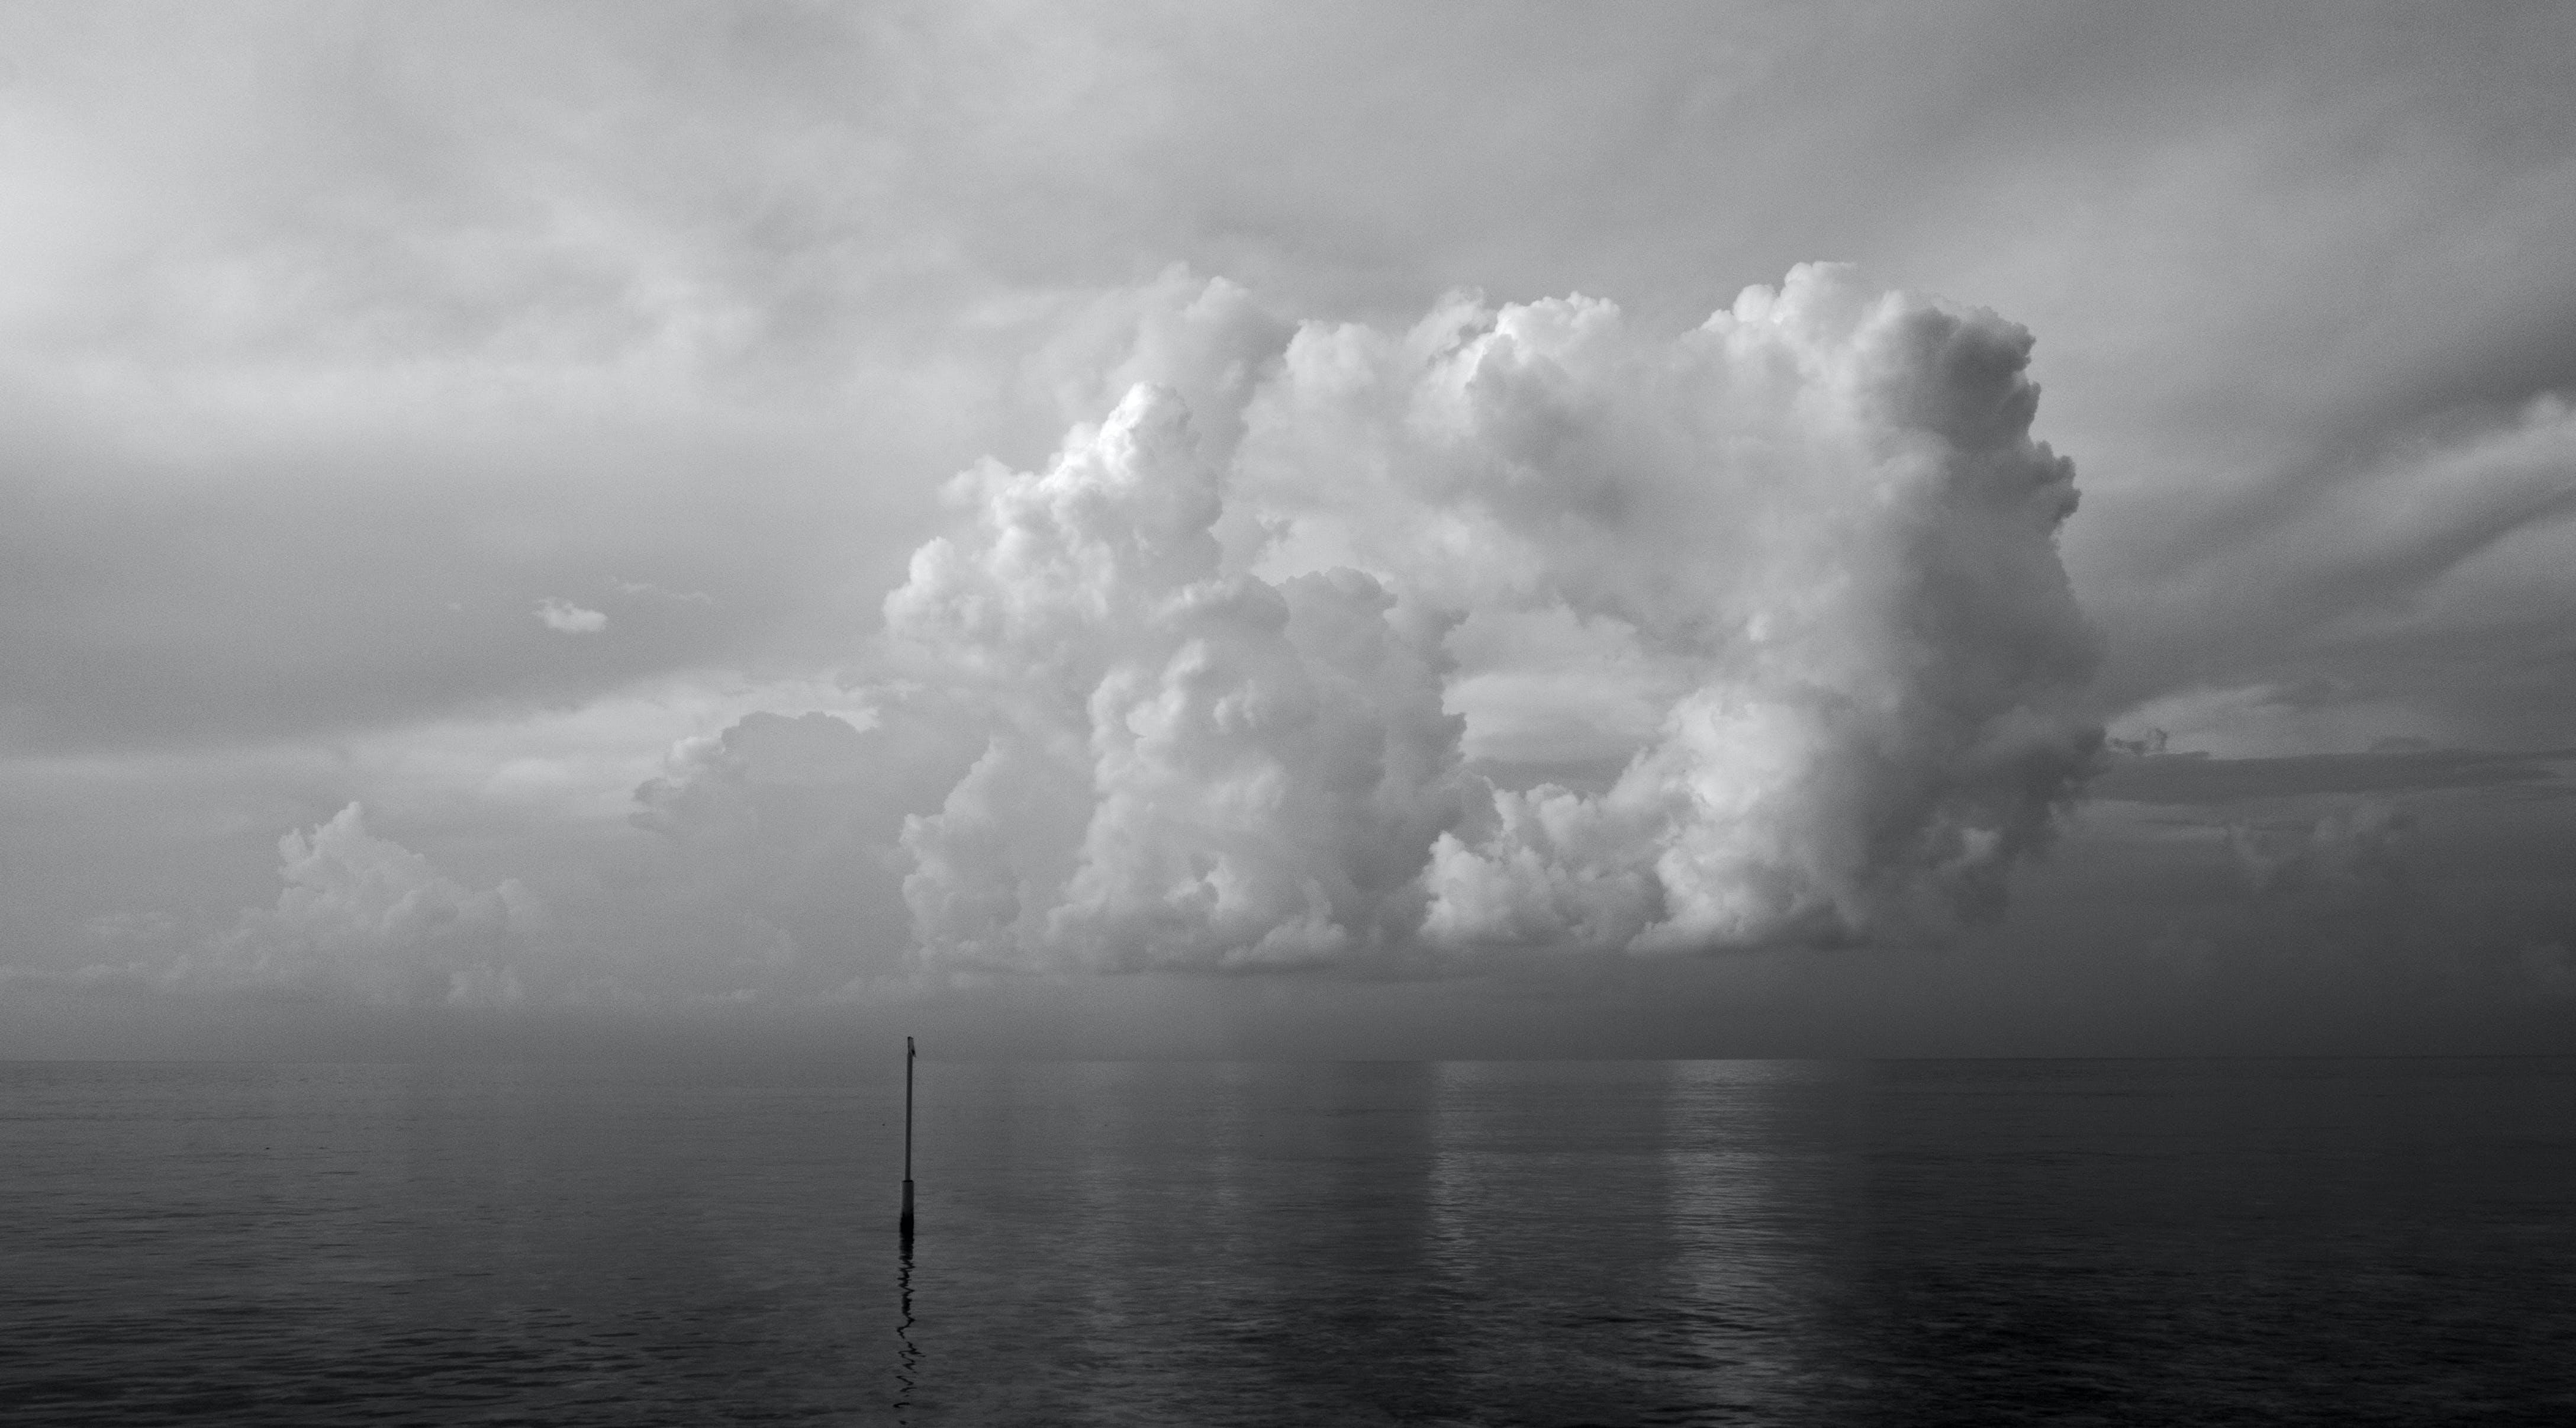 Monochrome Photo of Nimbus Clouds